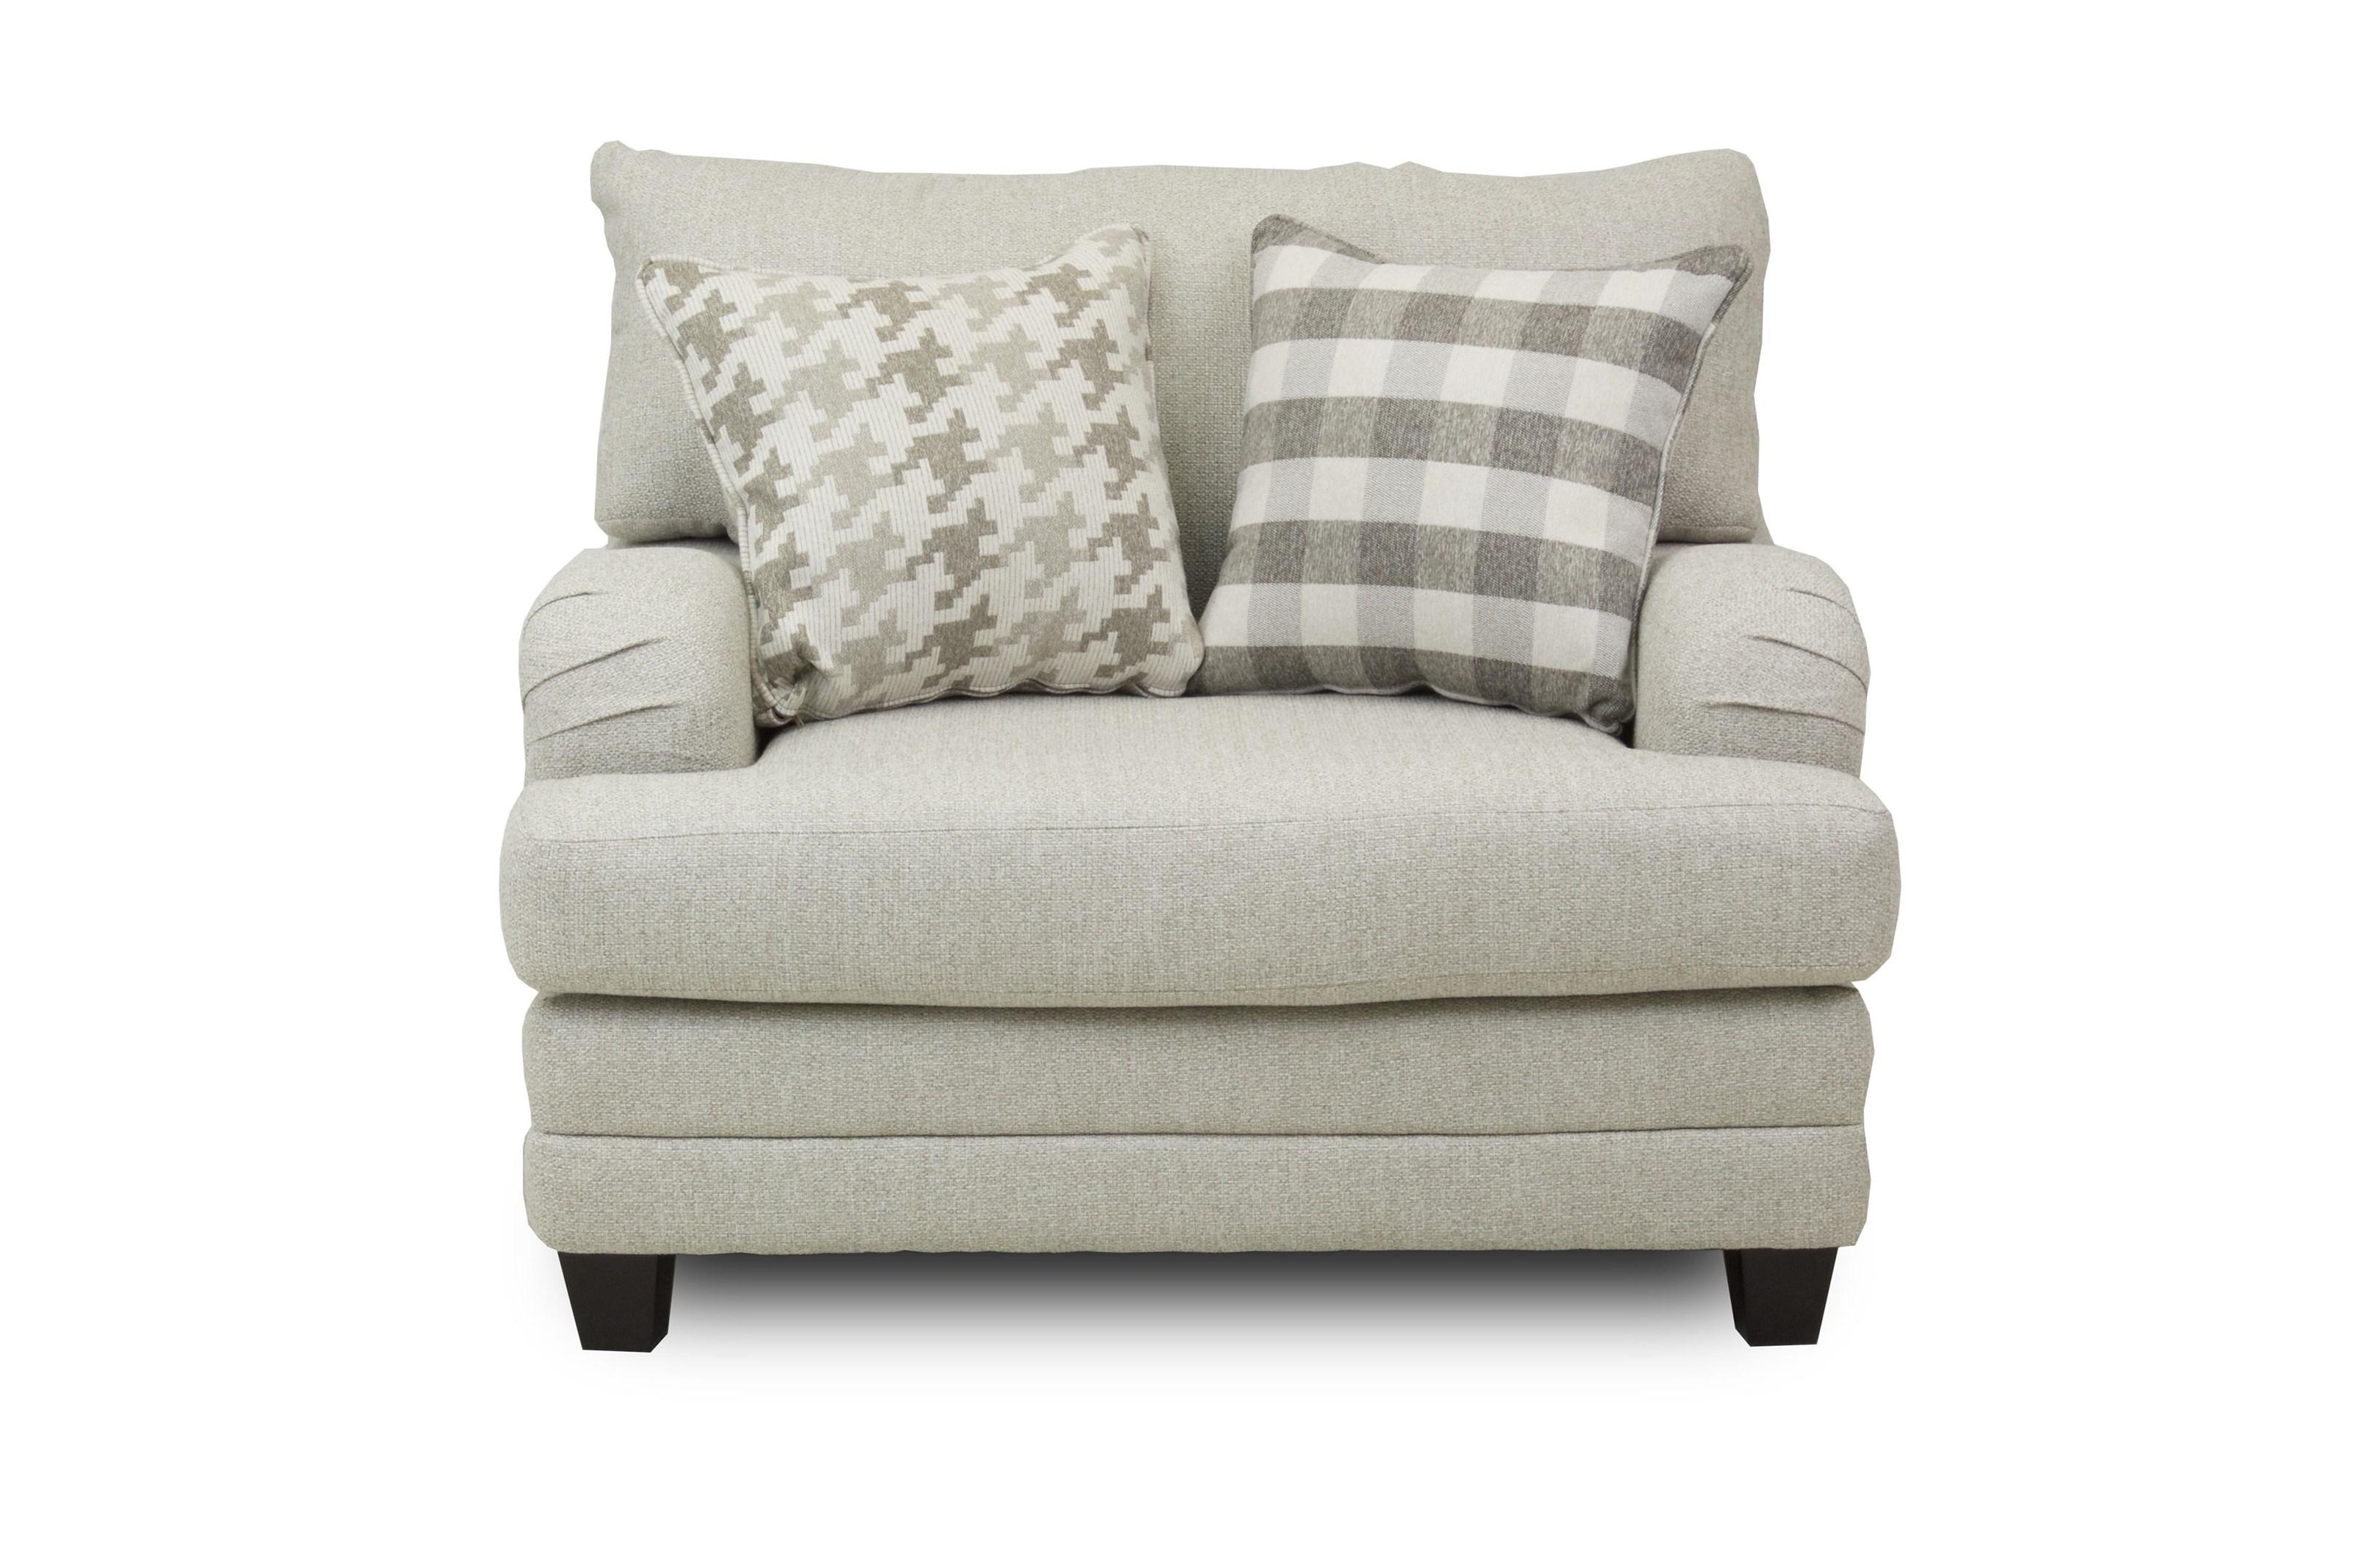 Fusion Furniture Brock Berber Chair and a Half - Item Number: 1744-C